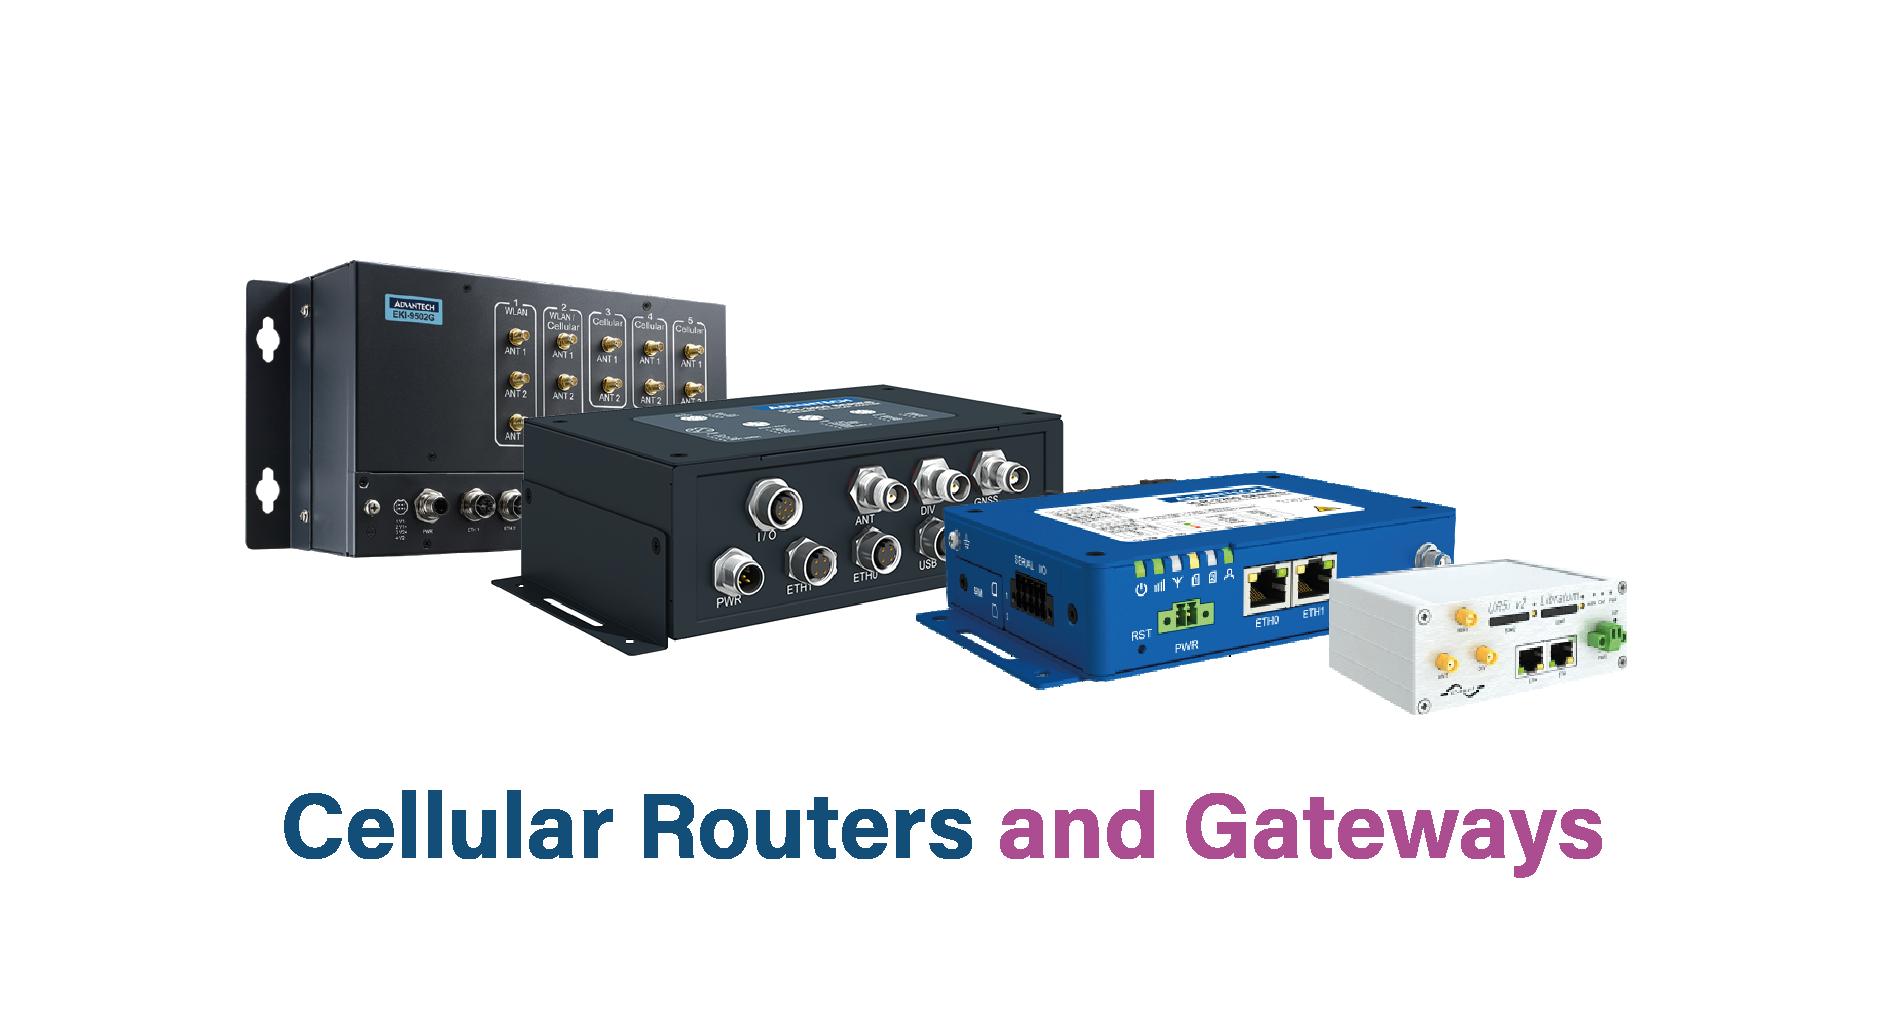 ind. cellular router